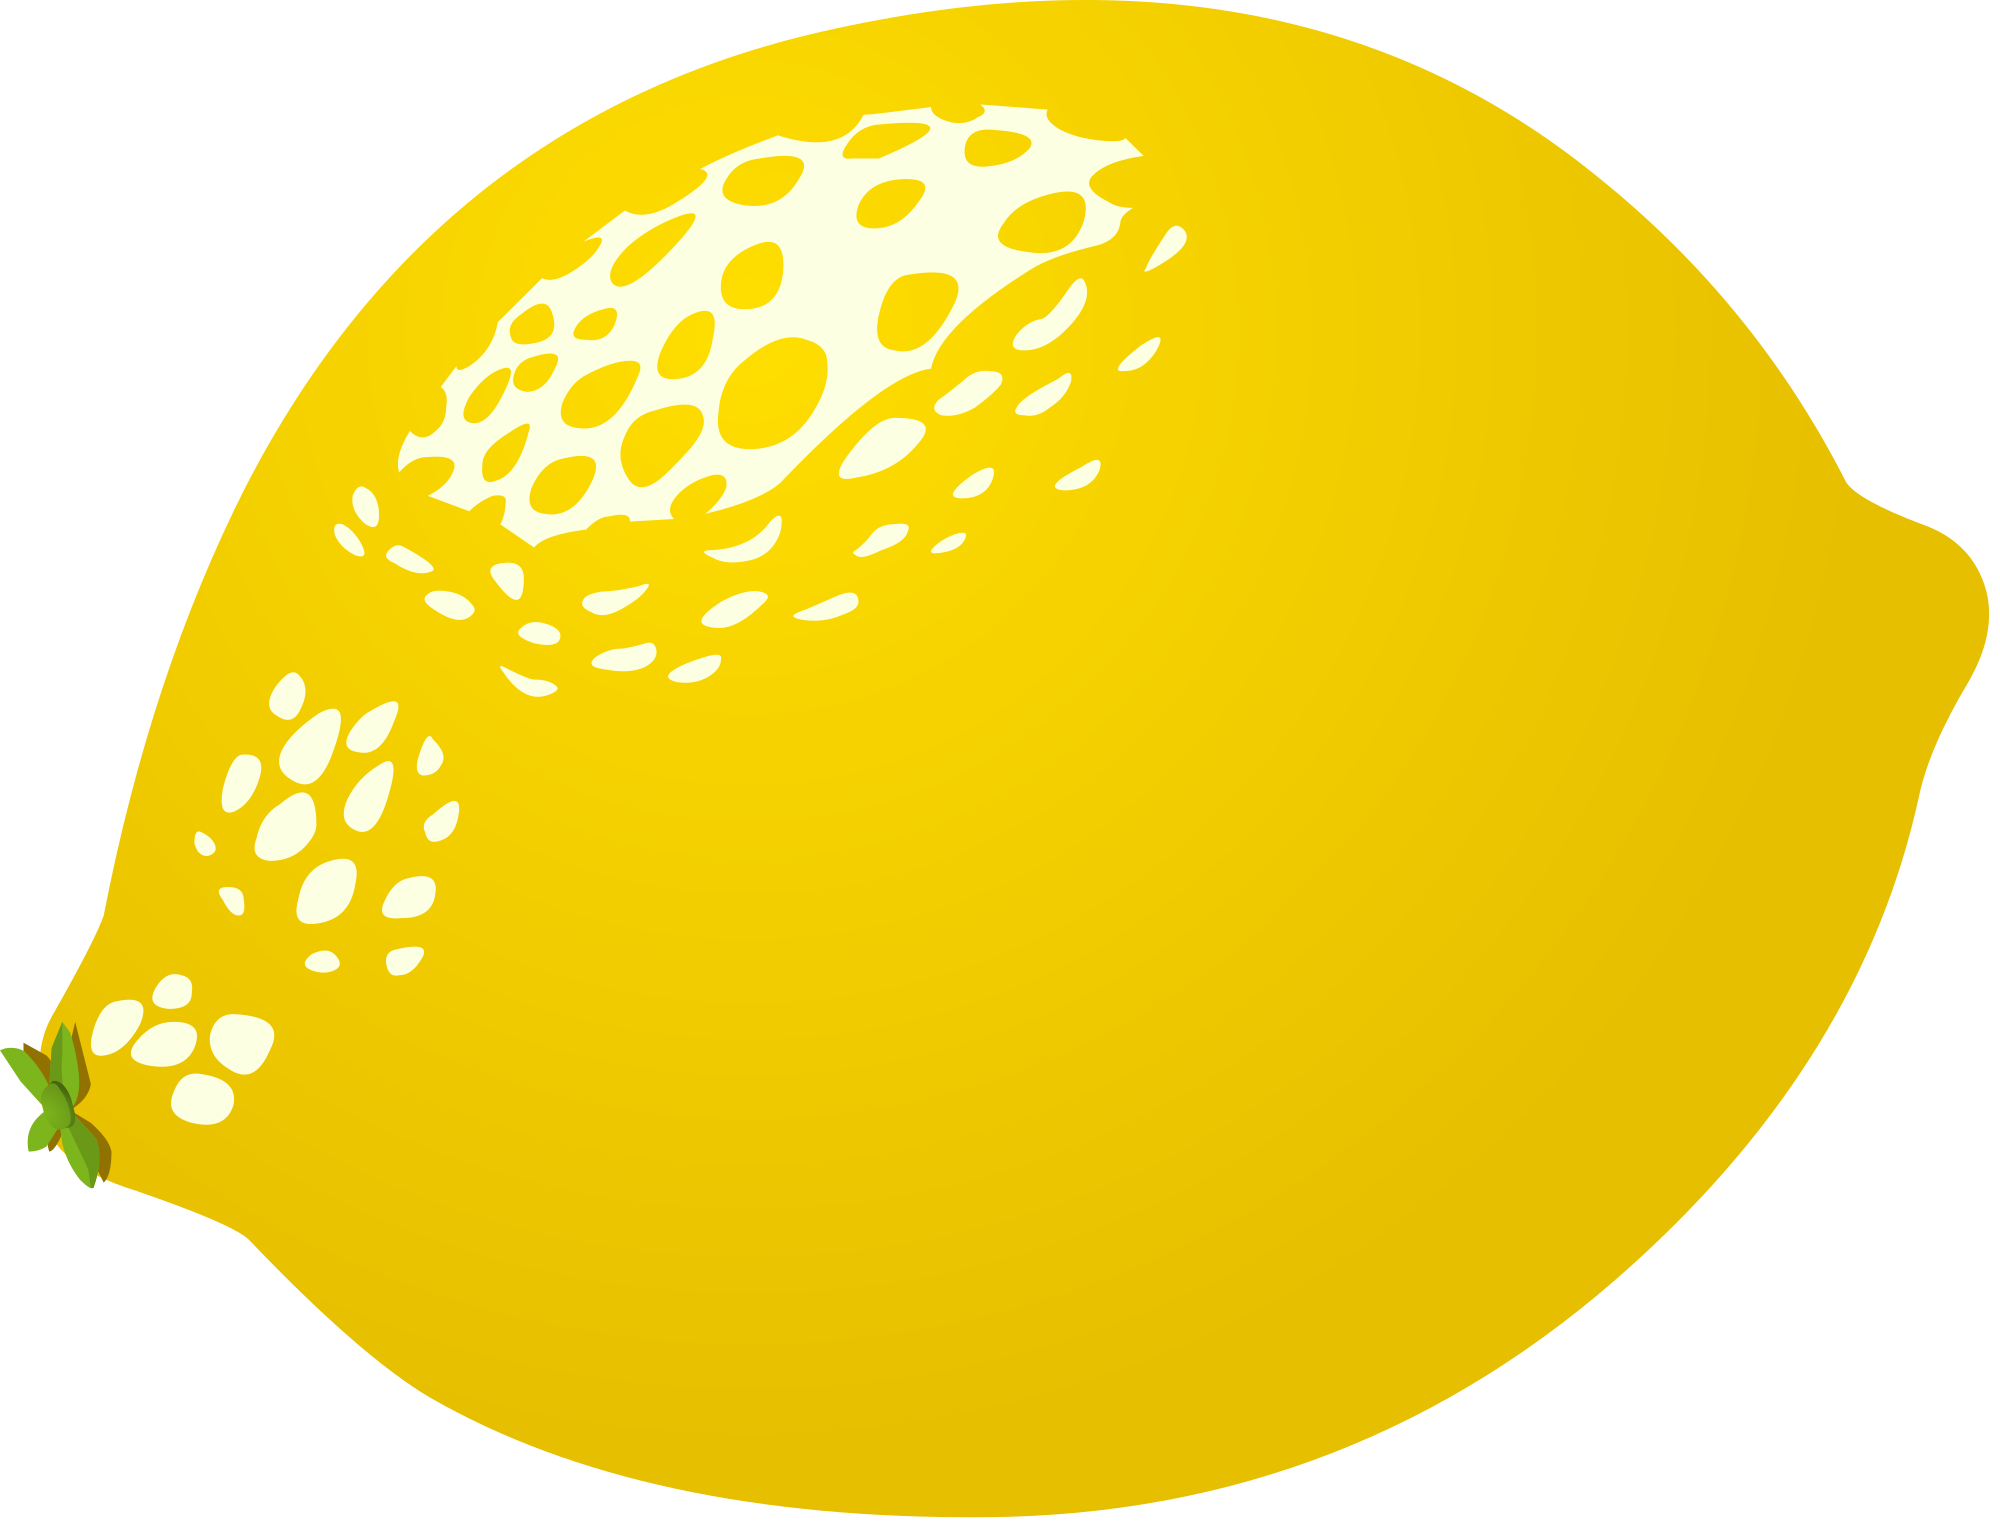 Lemon png image purepng. Lemons clipart transparent background